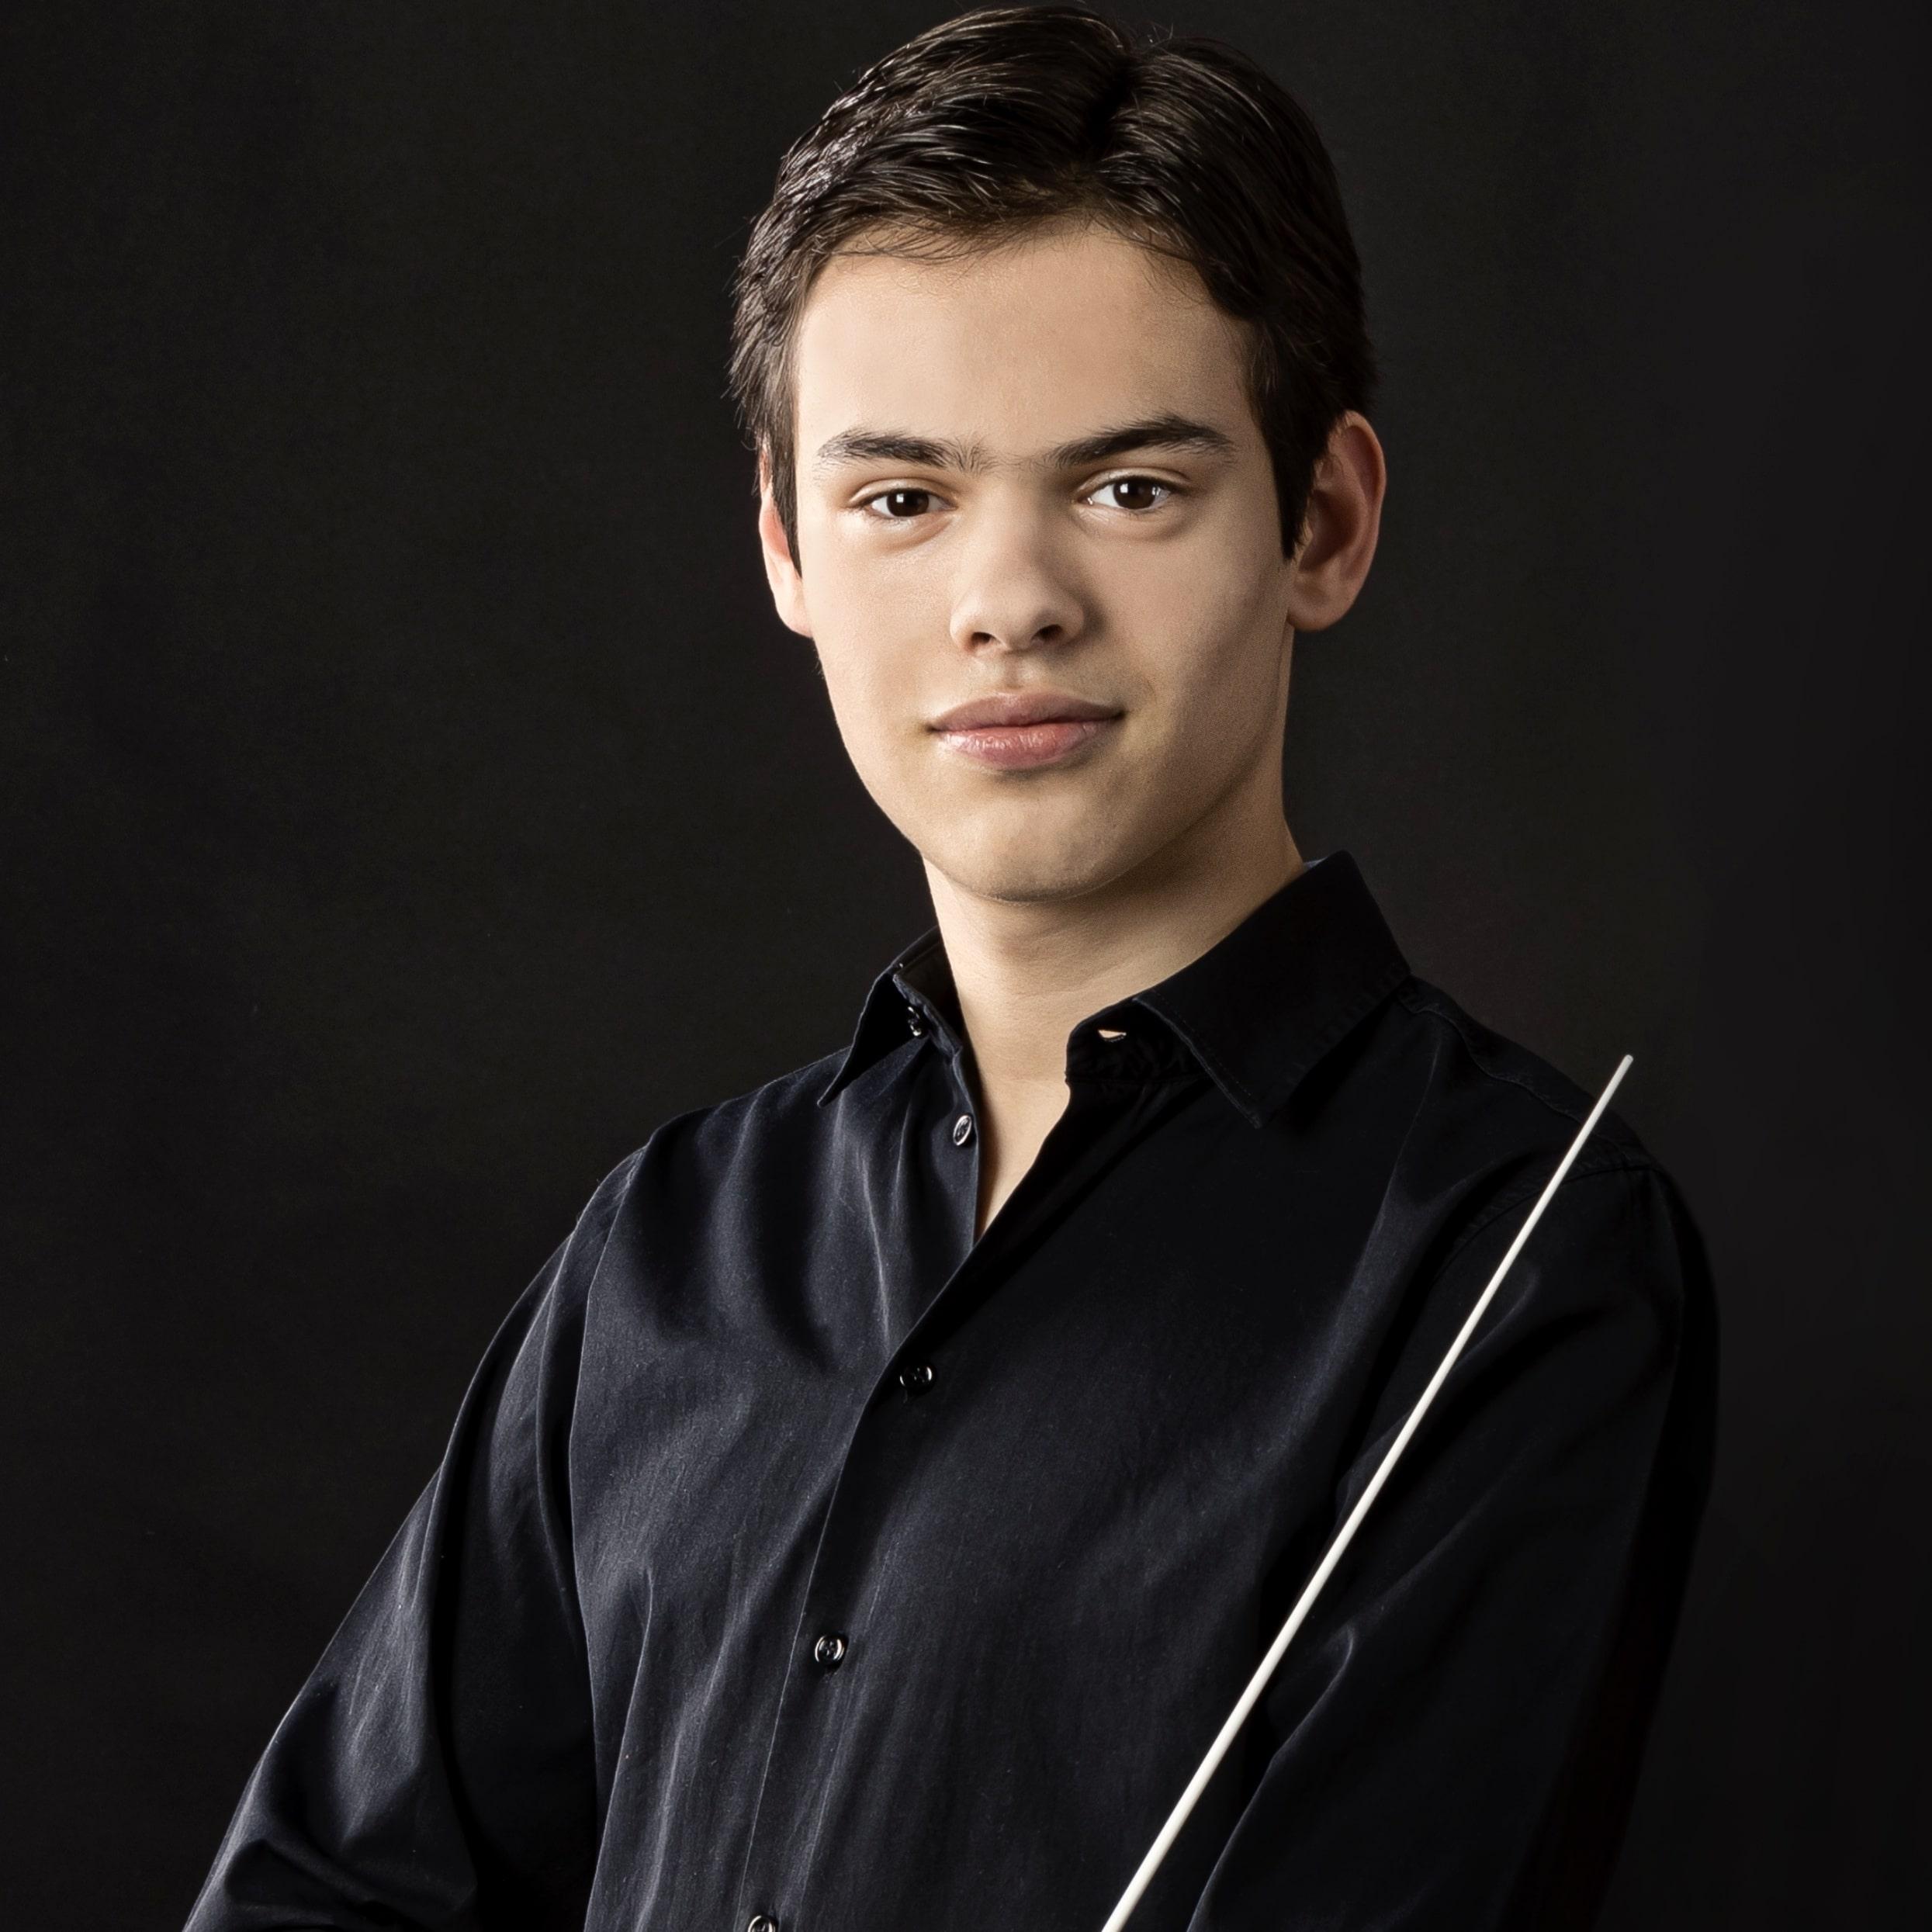 Maximilian Haberstock